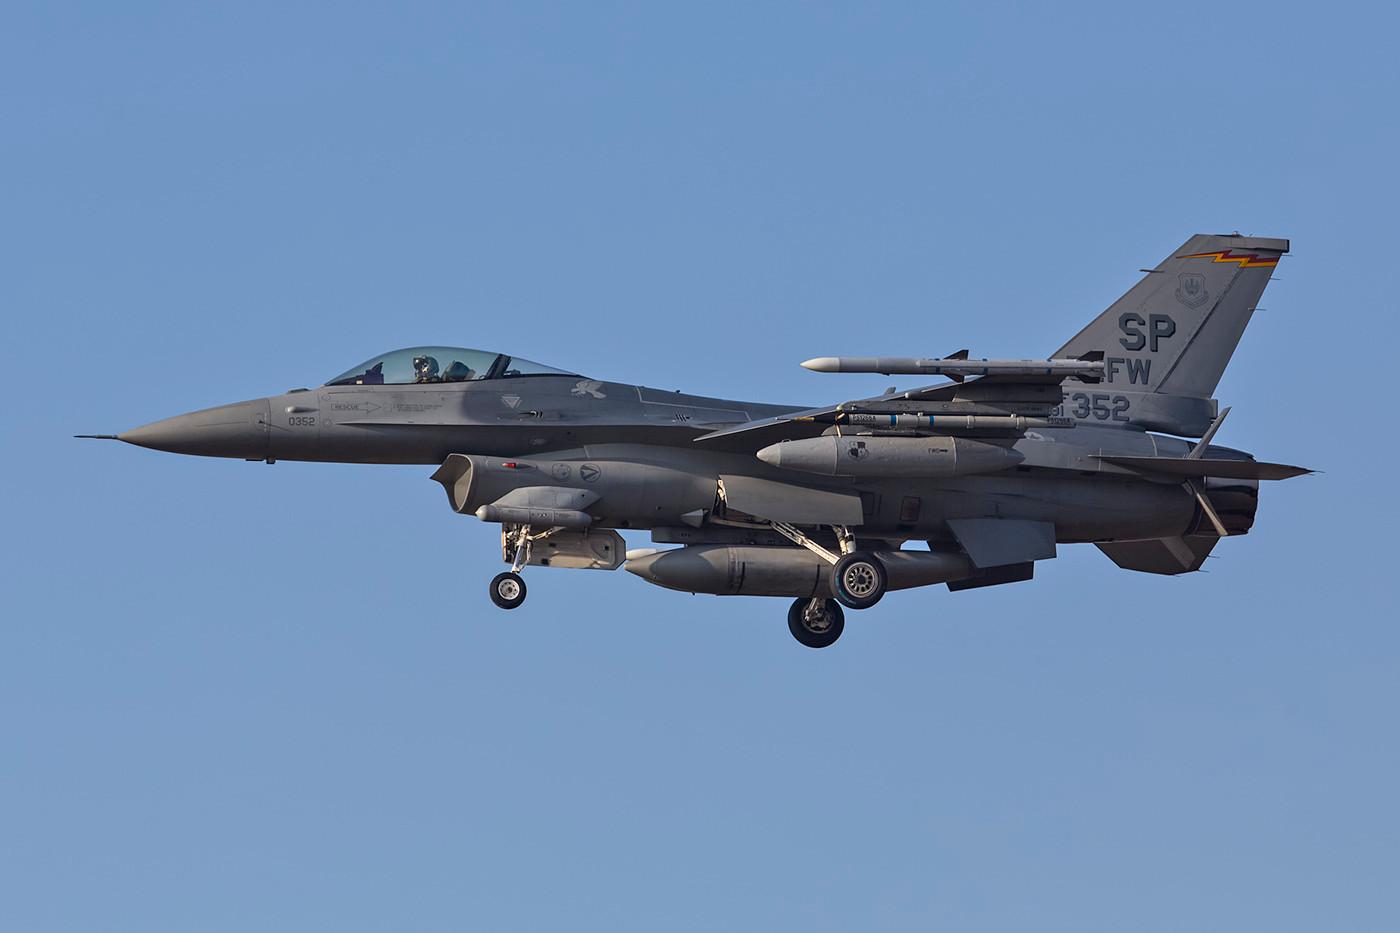 SPM 13.02.2015; 91-0352, F-16C, 52nd FW Spangdahlem (Deutschland)